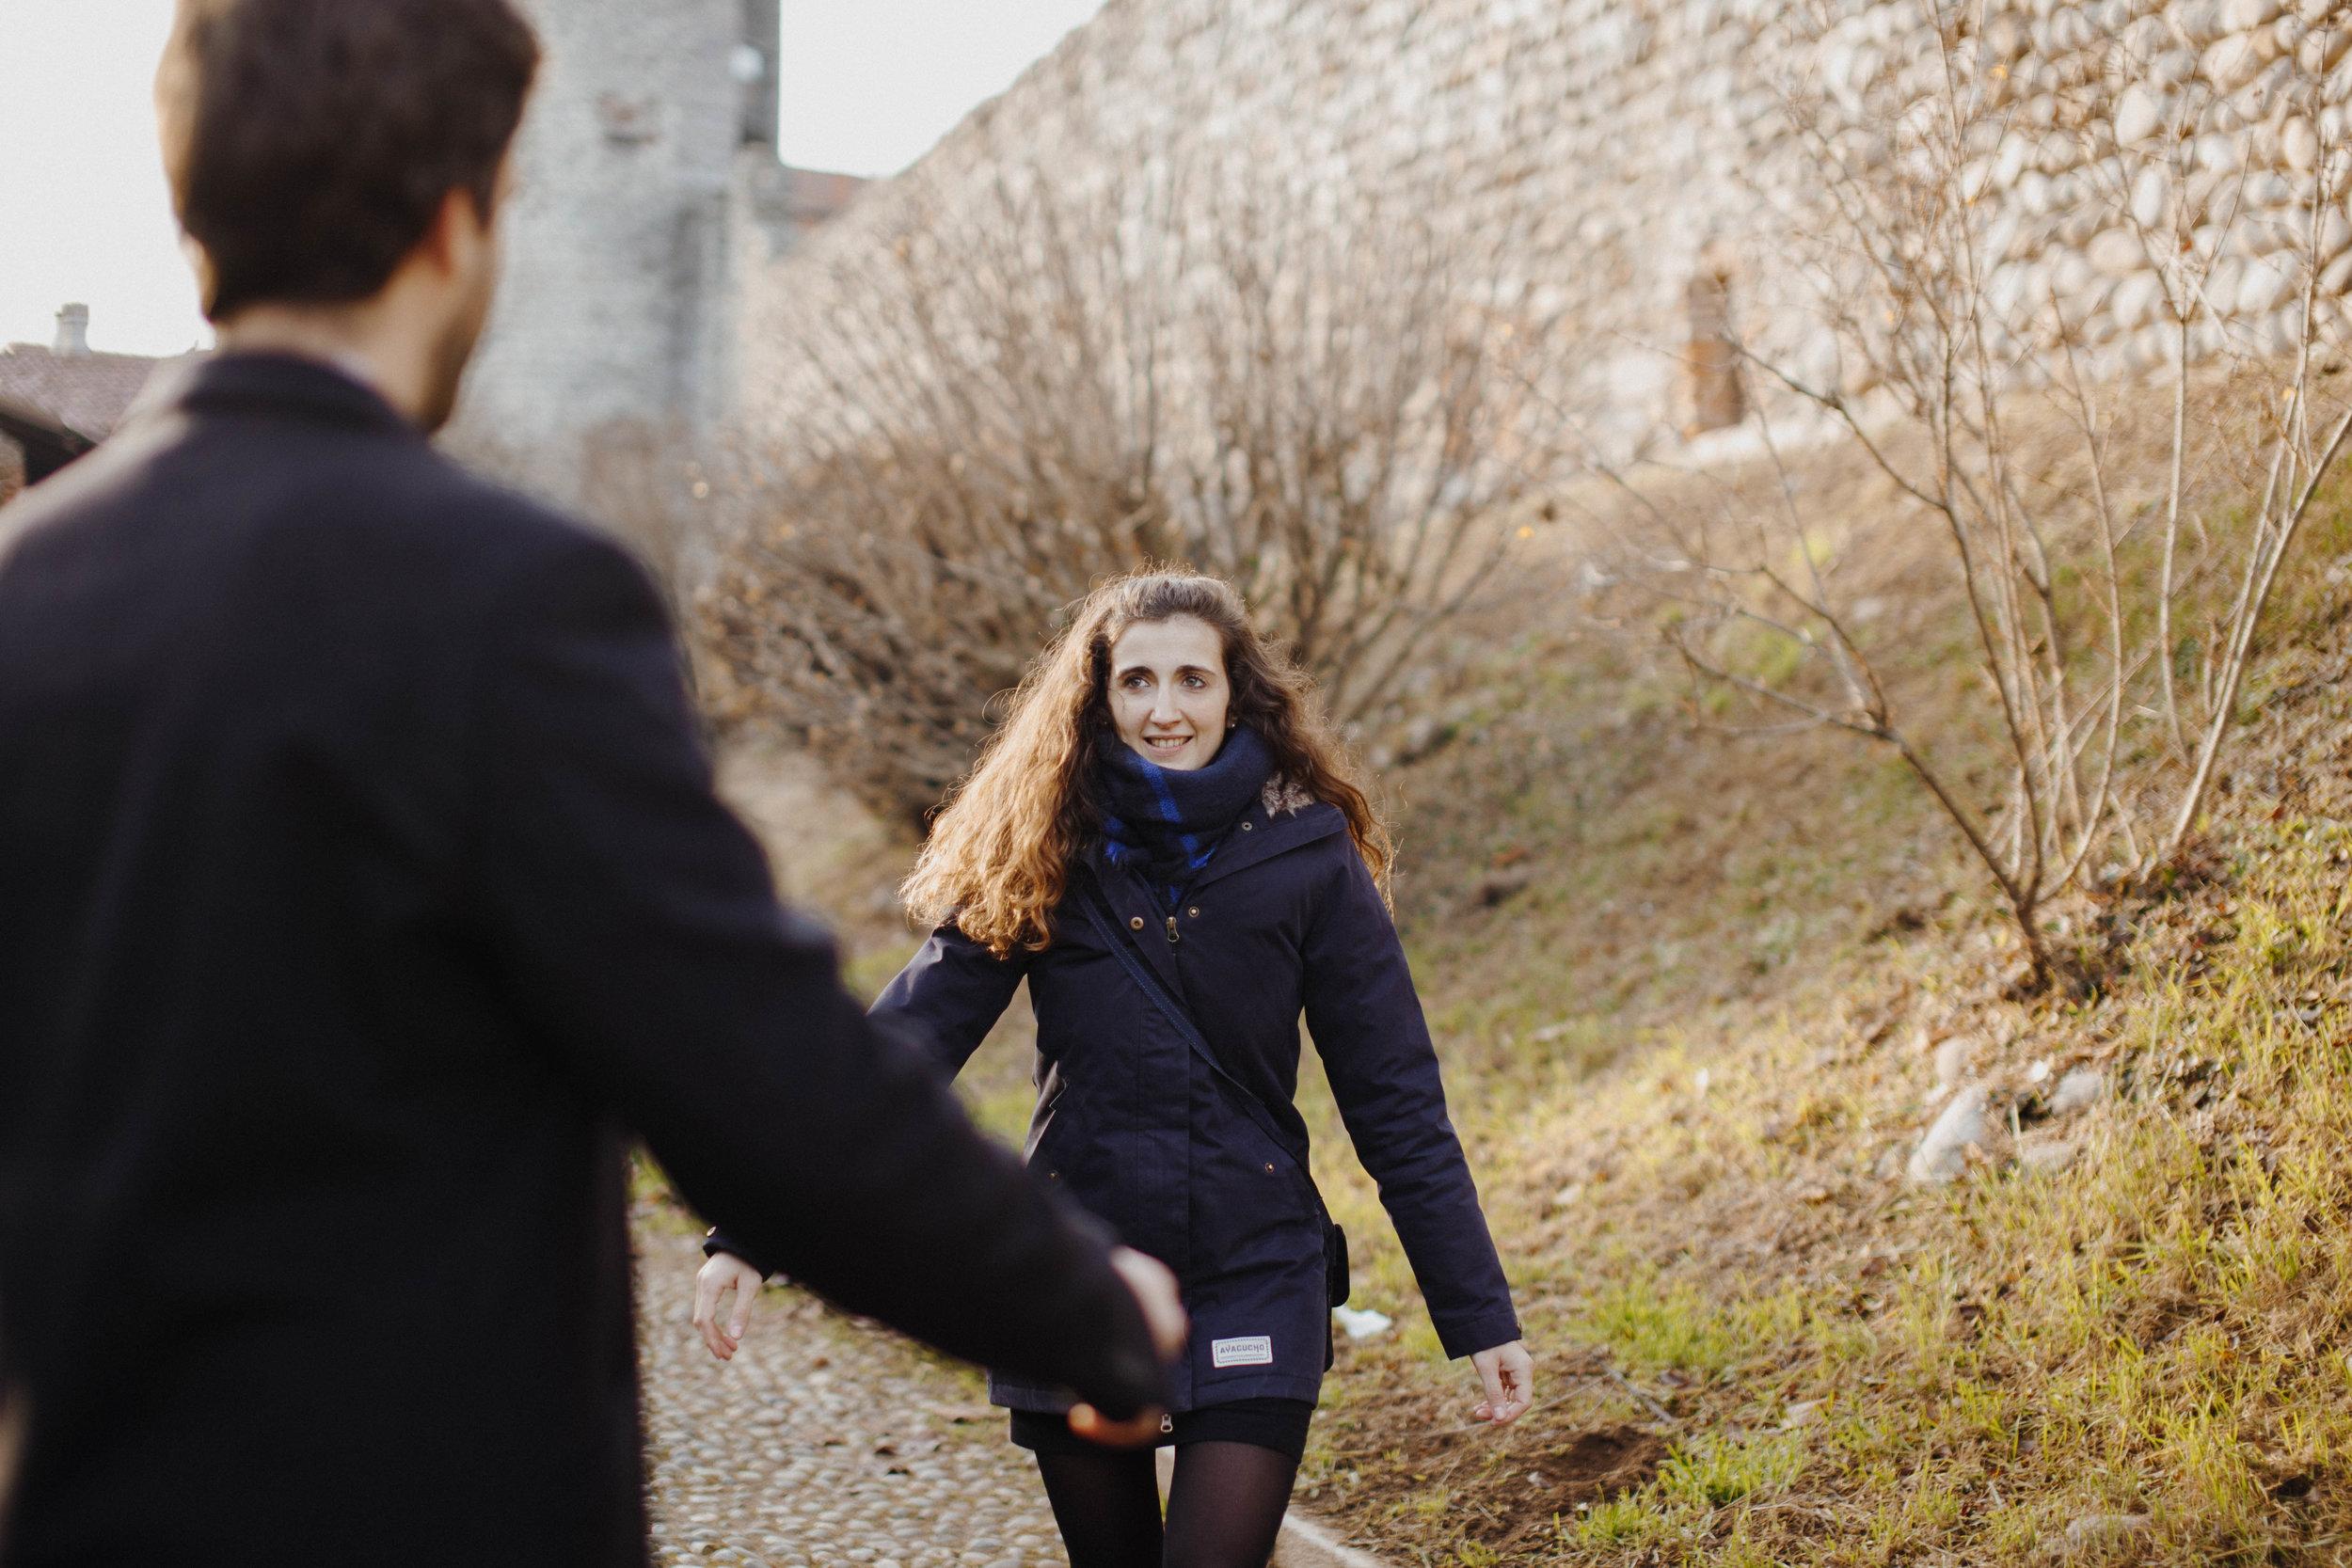 011 - Elisa + Riccardo - engagement.JPG